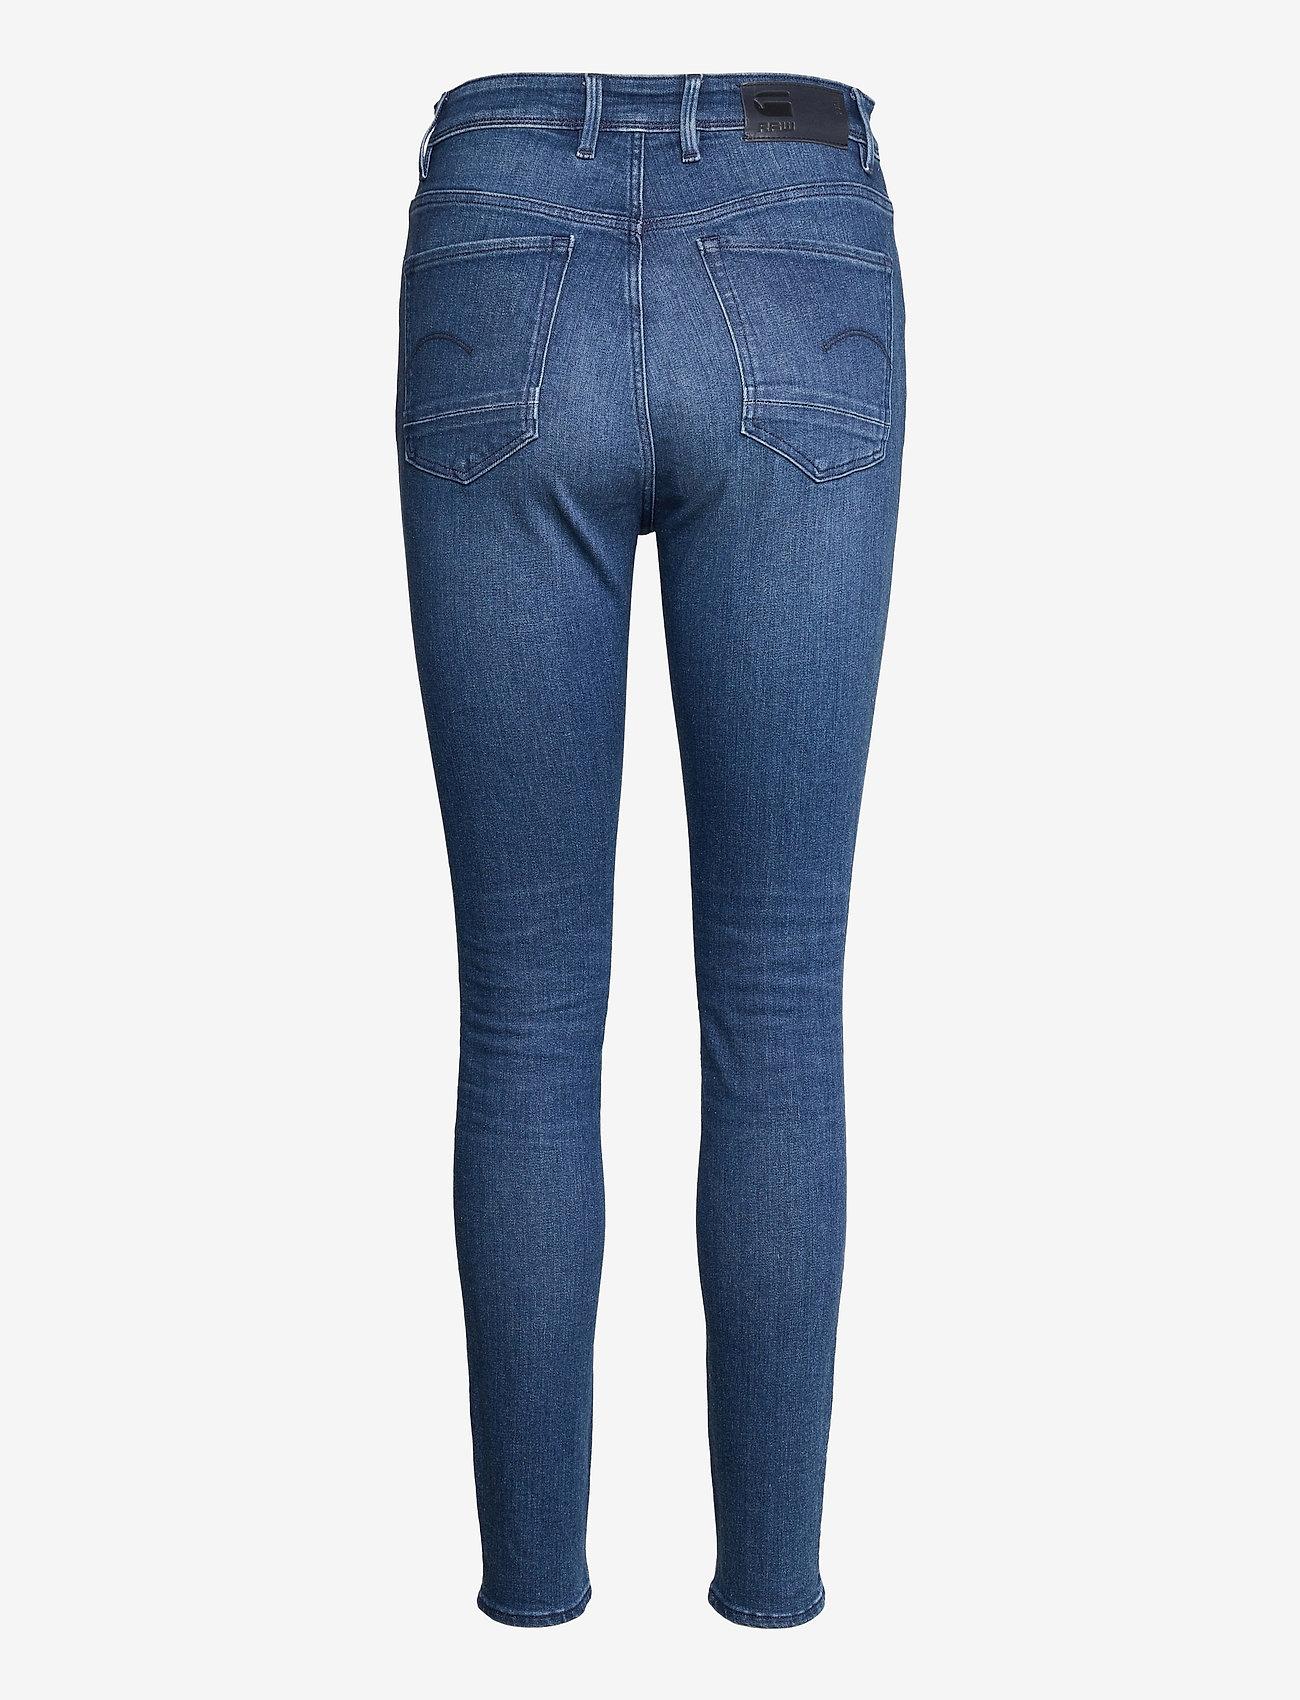 G-star RAW - Kafey Ultra High Skinny Wmn - skinny jeans - faded neptune blue - 1